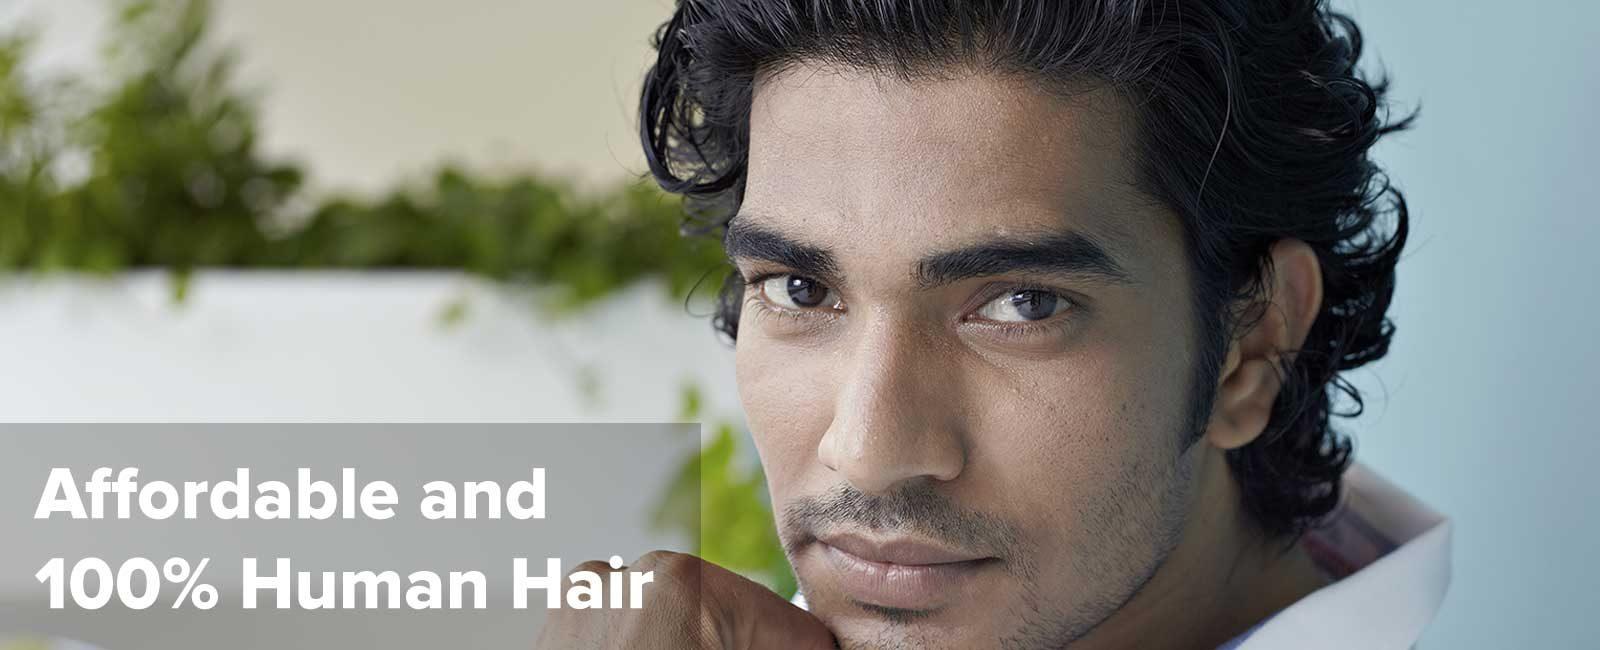 Affordable 100% Human Hair